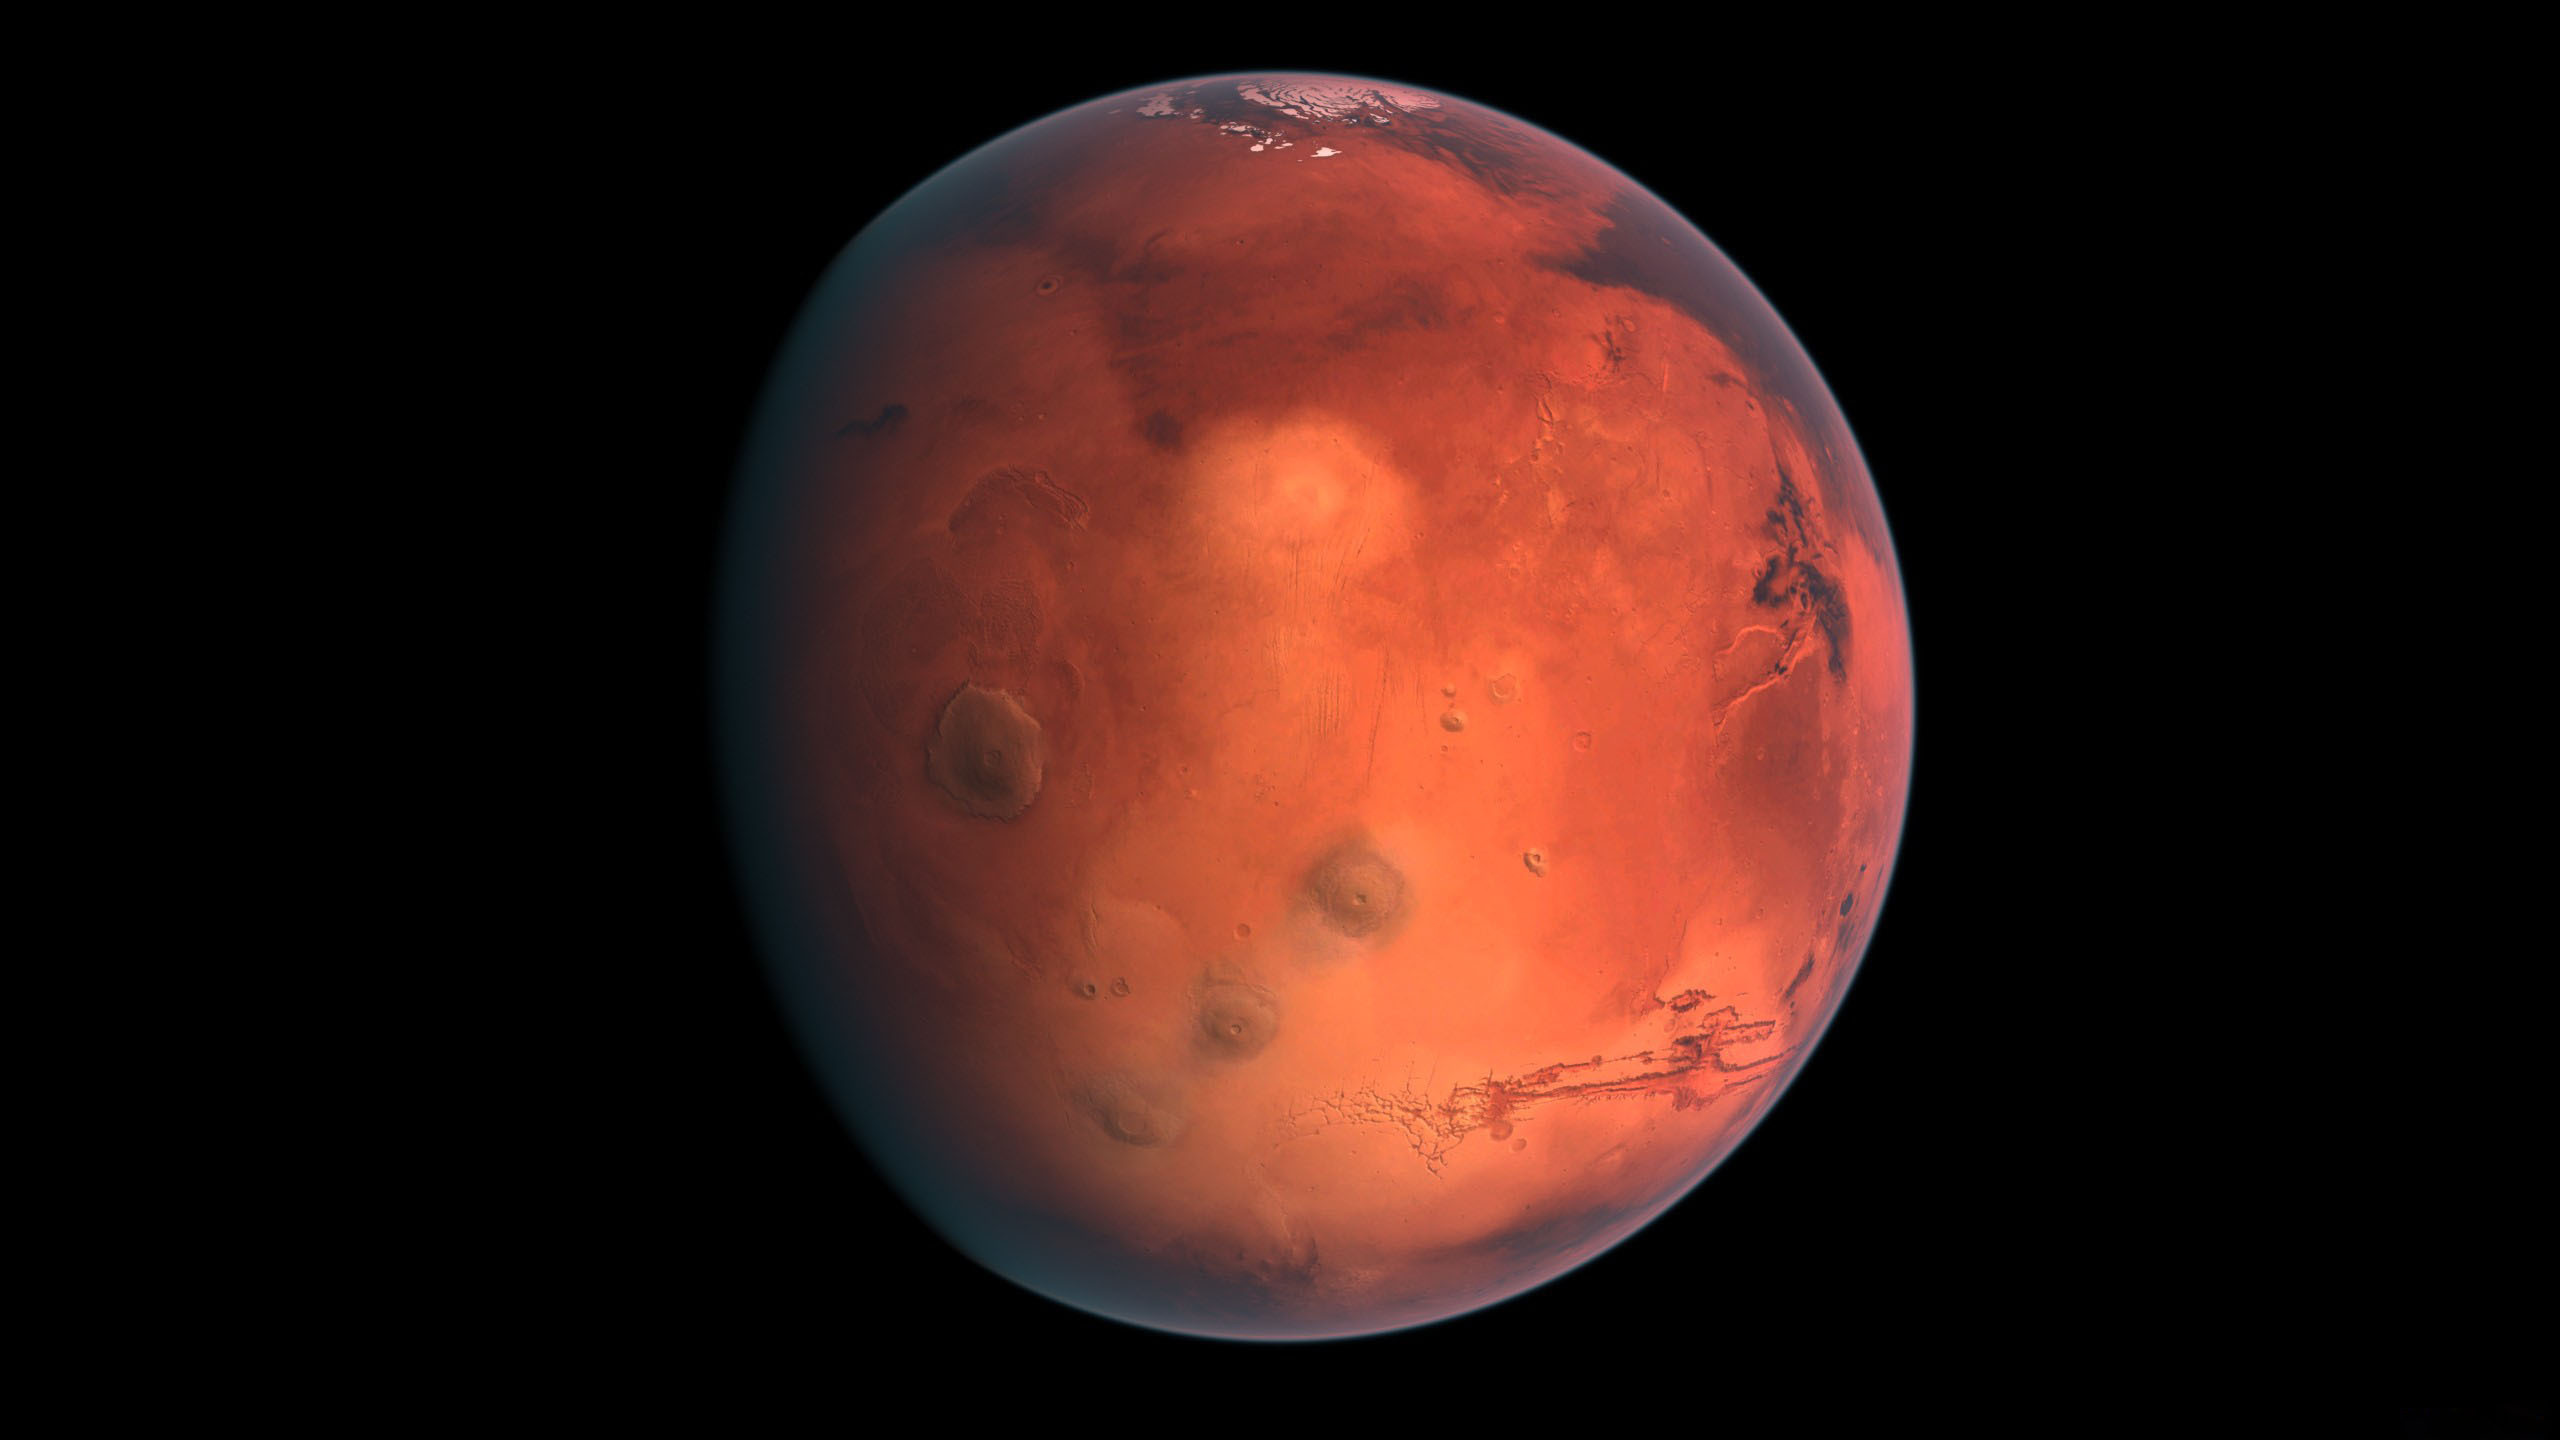 Planet Mars wallpaper 2560x1440 148764 WallpaperUP 2560x1440